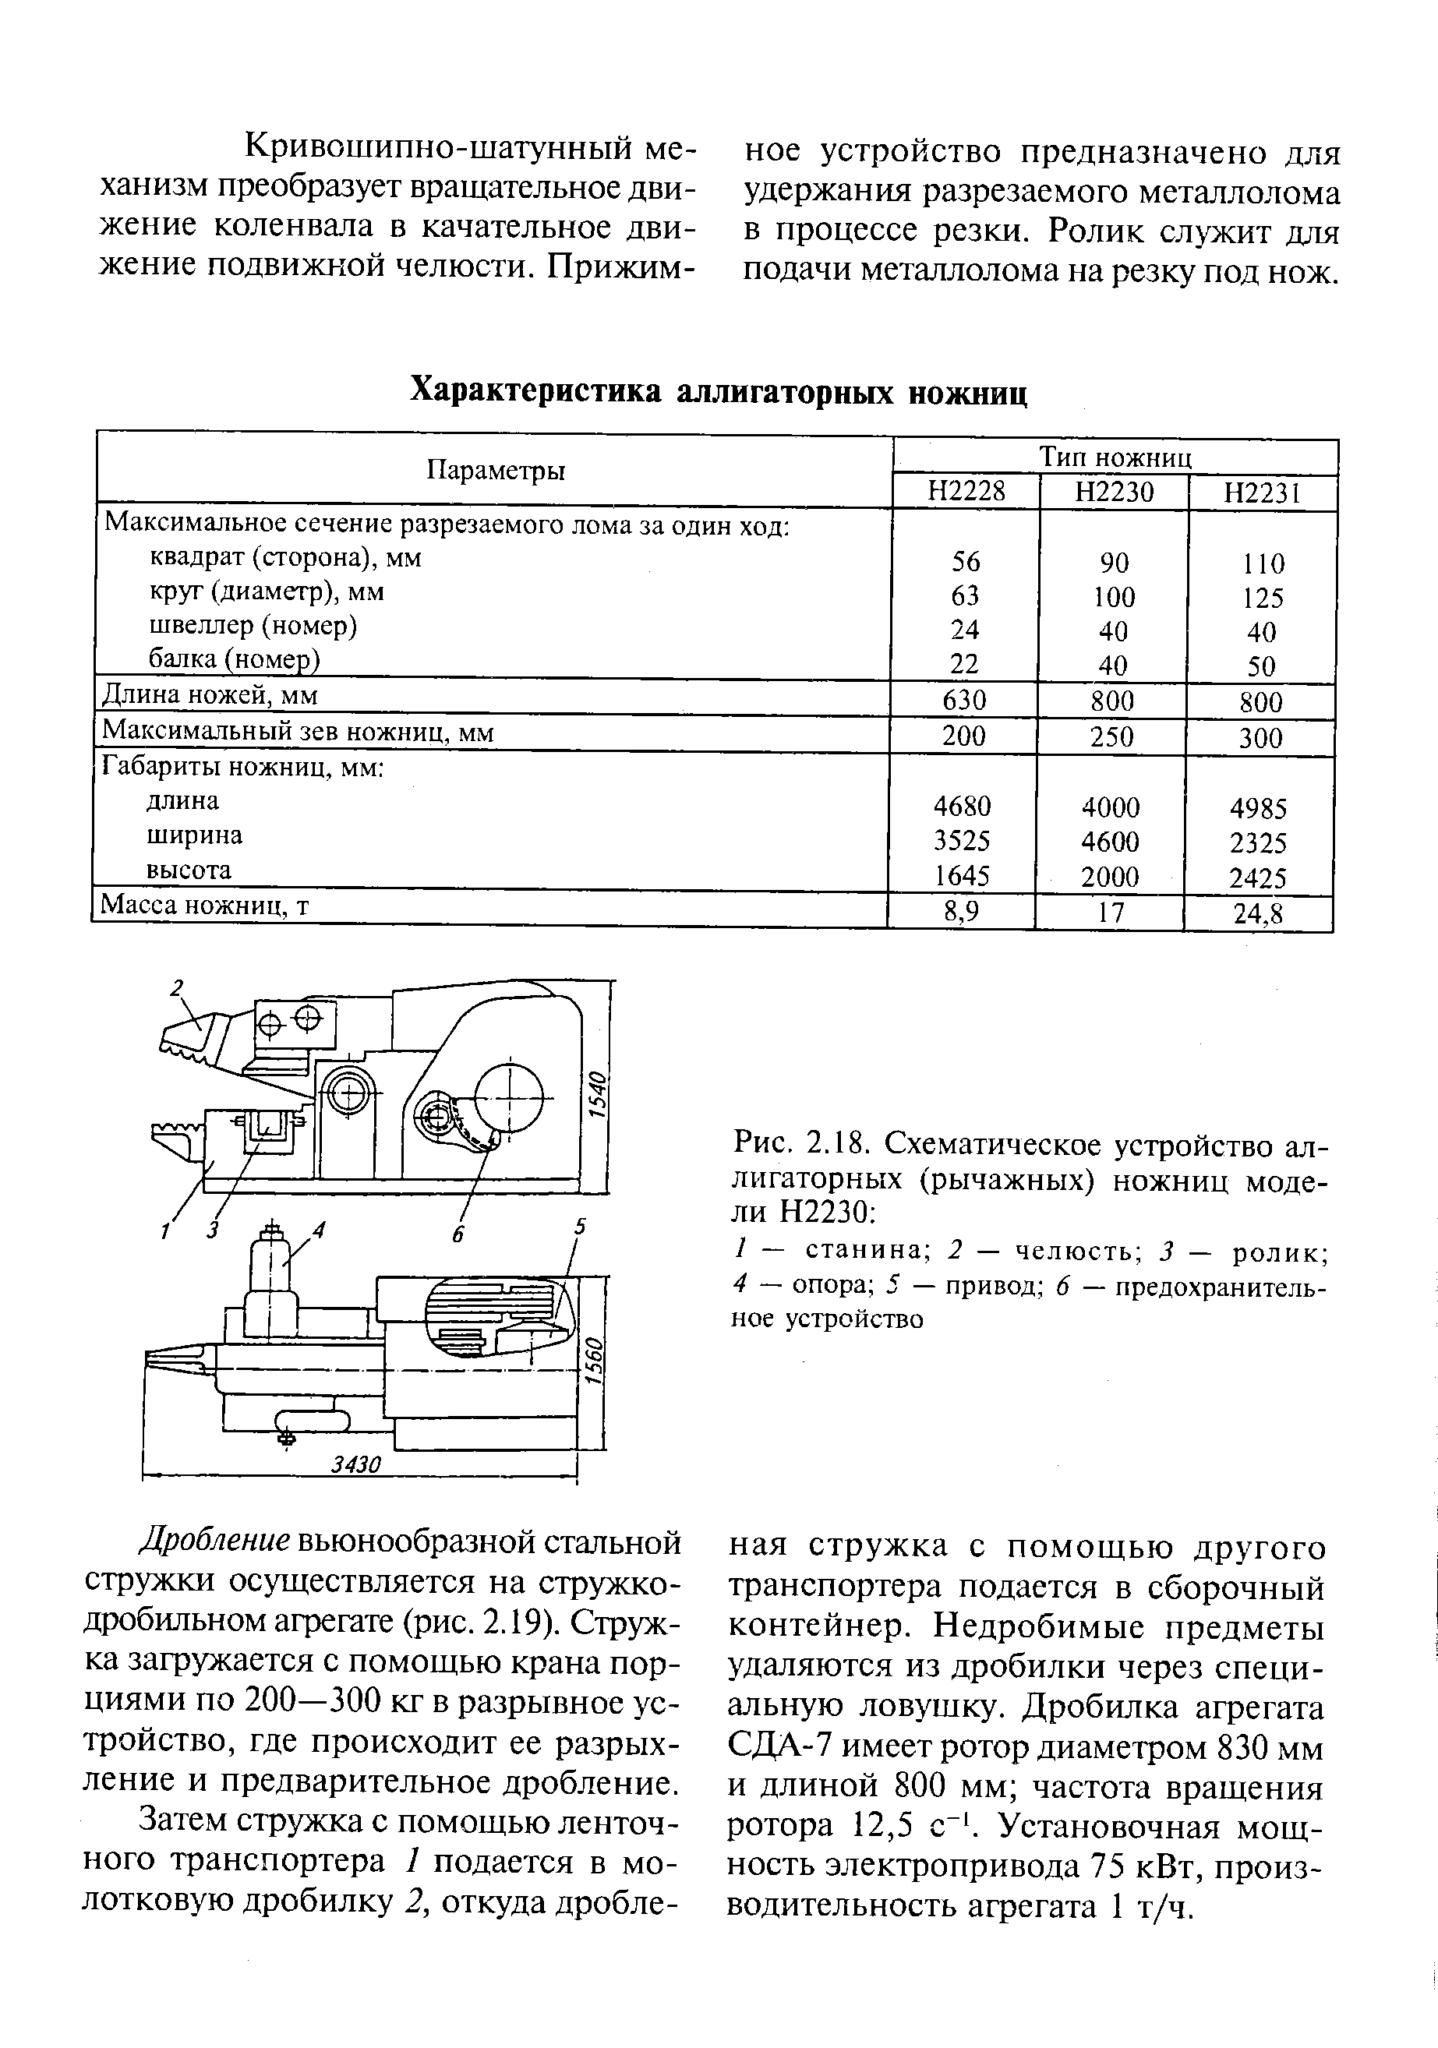 Характеристика аллигаторных ножниц Н2228, Н2230, Н2231